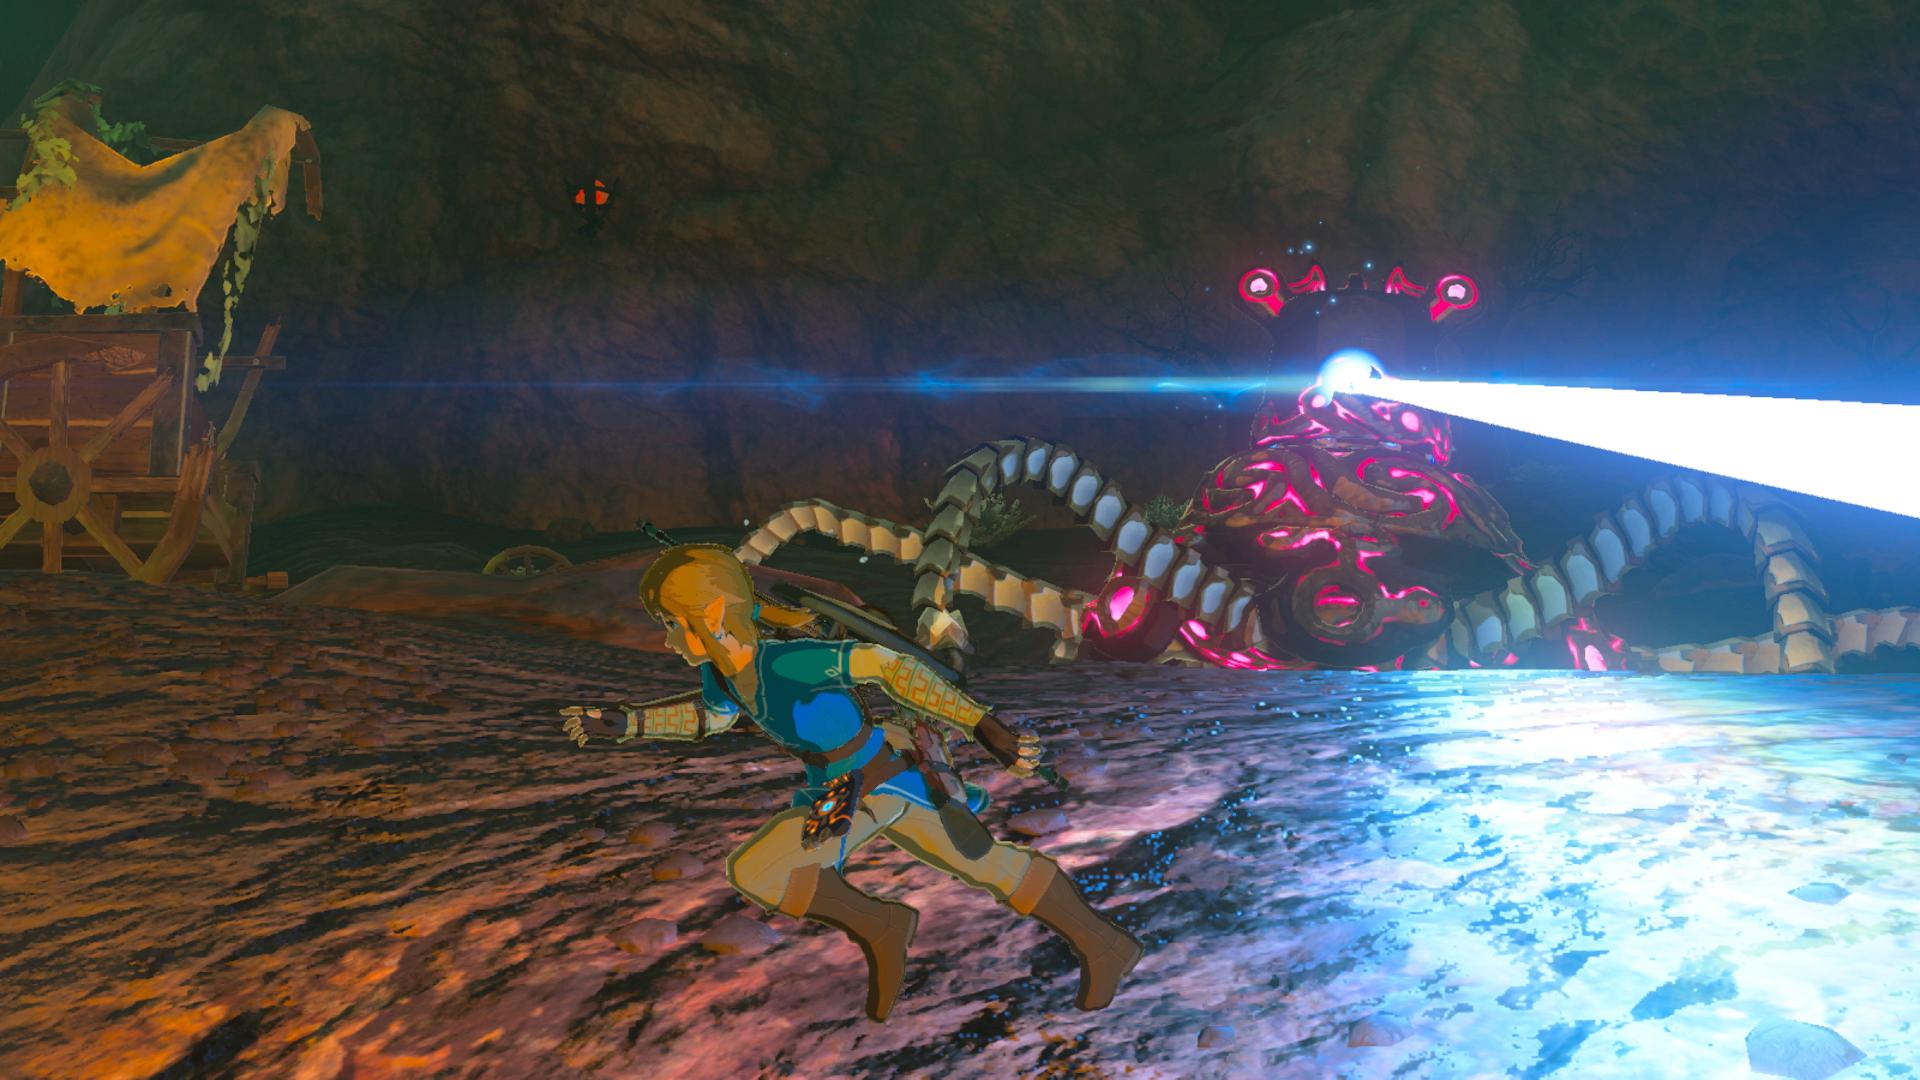 The Legend of Zelda: Breath of the Wild image 24